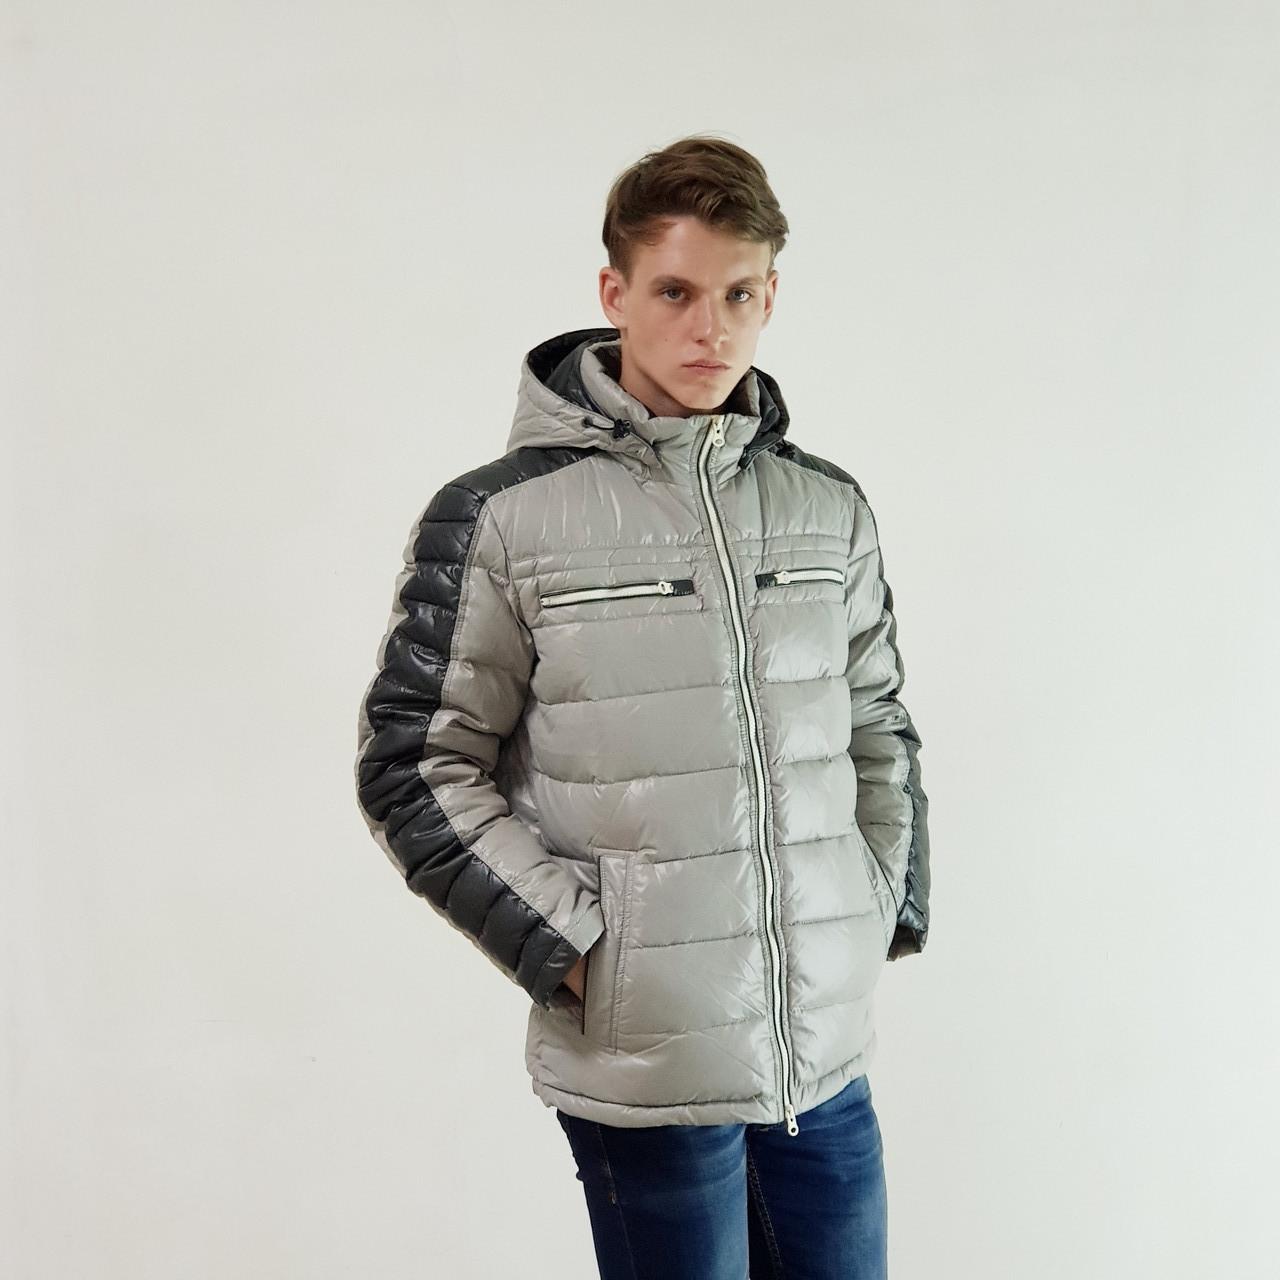 Куртка мужская зимняя Snowimage с капюшоном 52 светло-серый 312A-9354